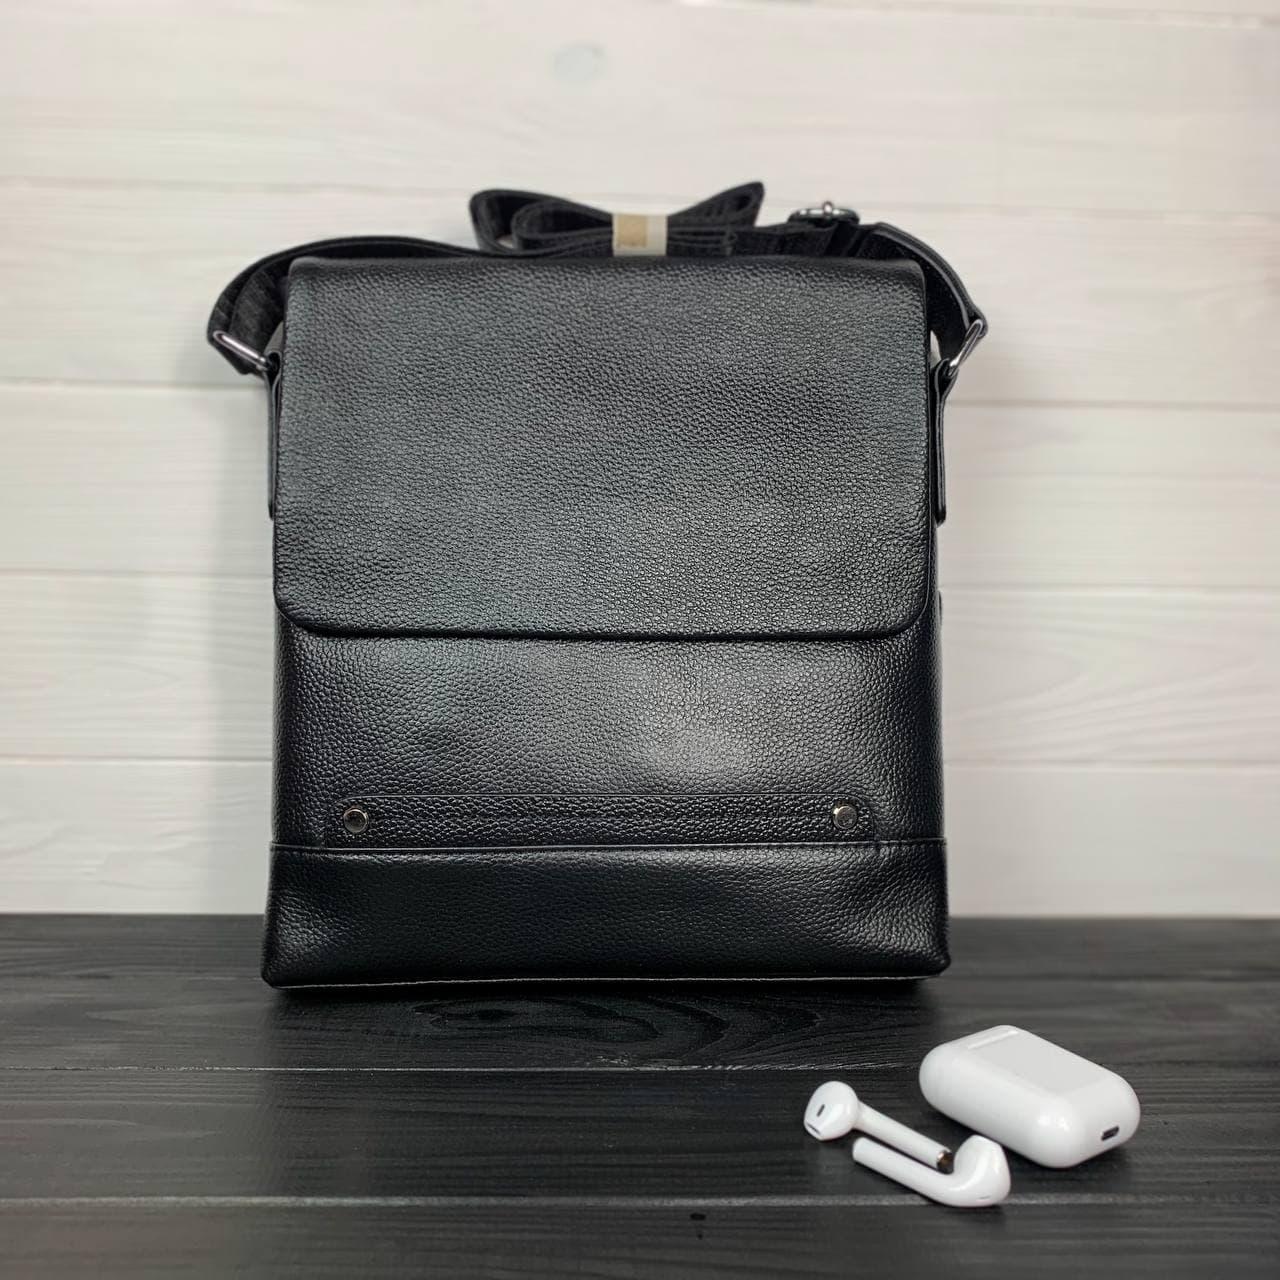 Сумка через плече чоловіча шкіряна Tiding Bag C925-0A